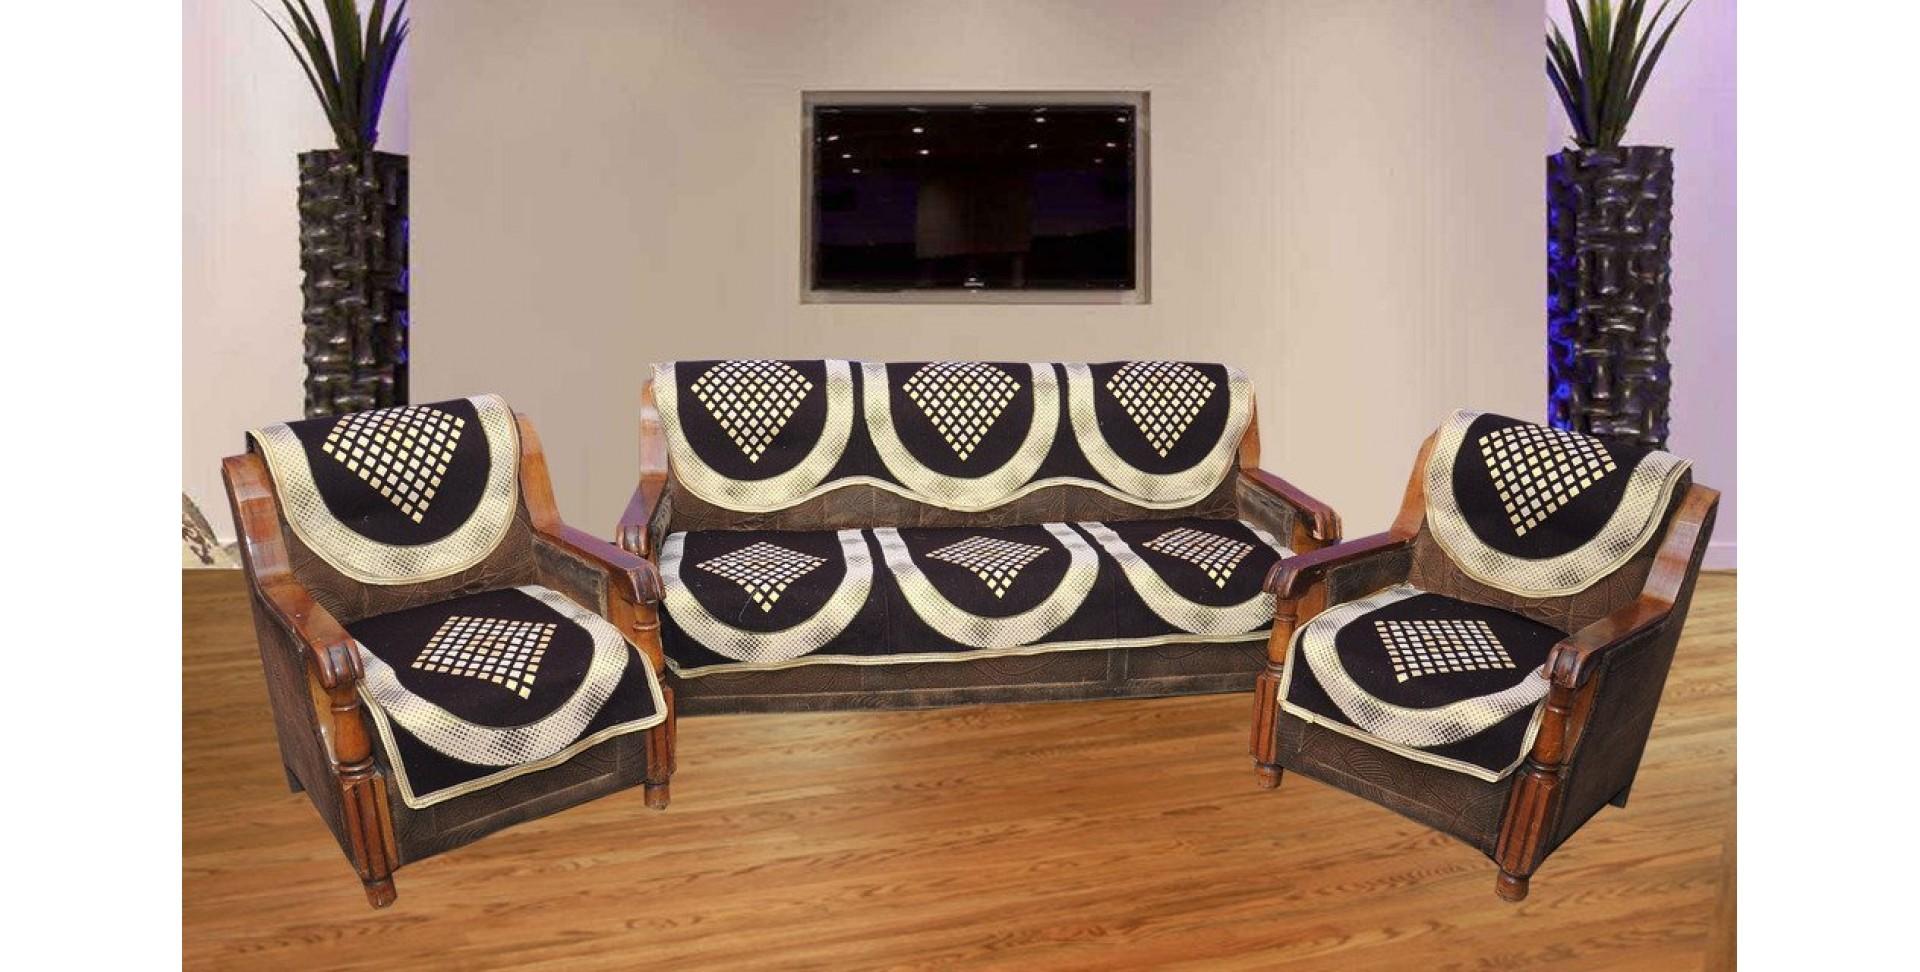 Vivek Homesaaz 5 Seater Poly Cotton Set of 10 Sofa Cover Set